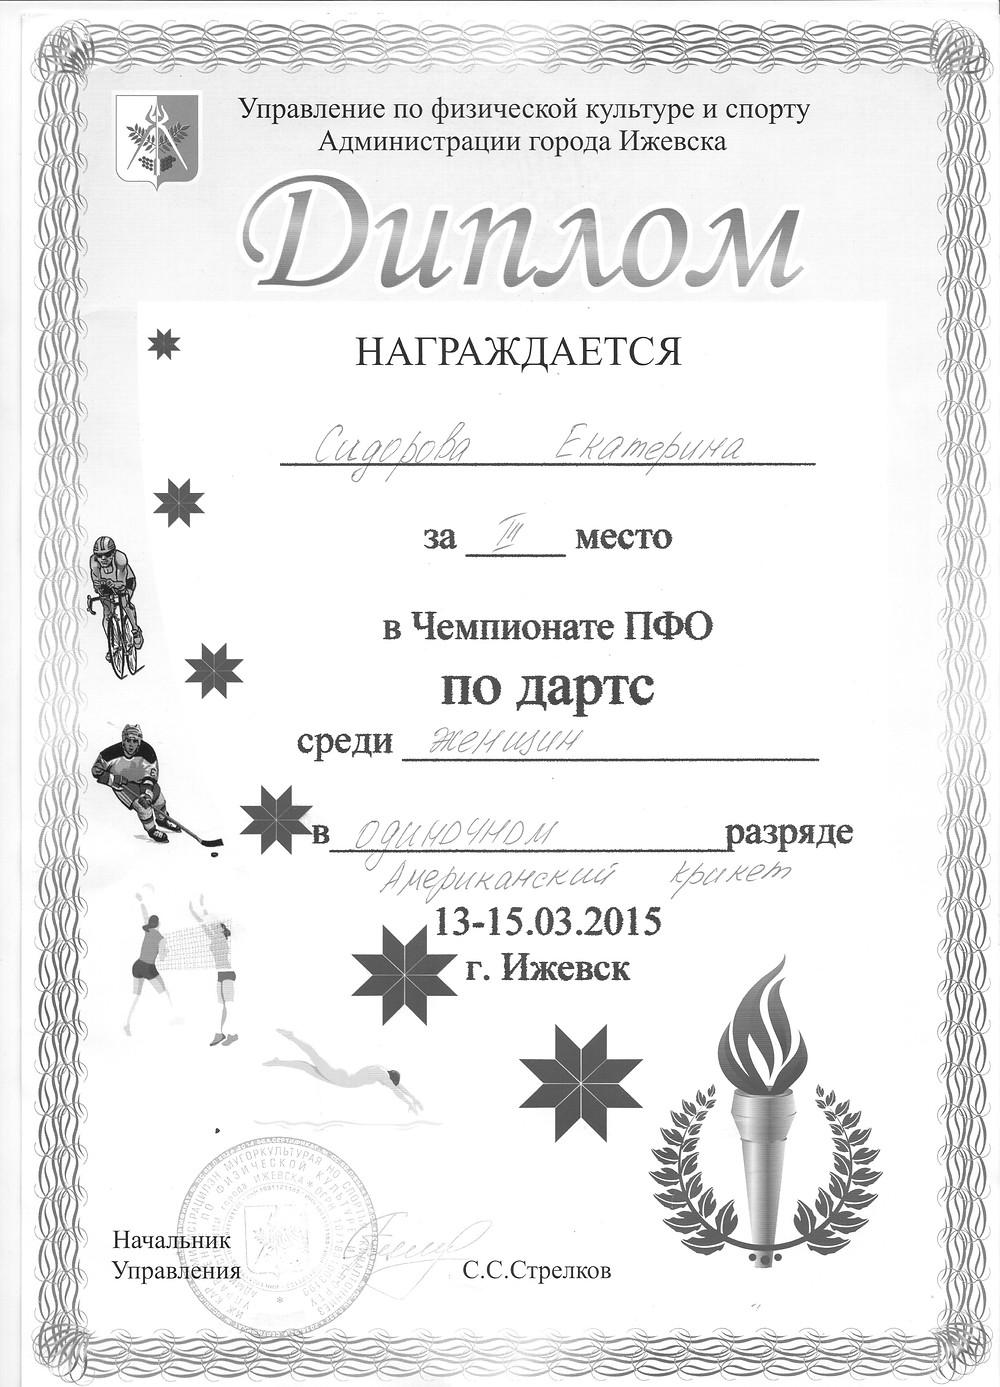 Сидорова Екатерина 3 Чемпионат.jpg